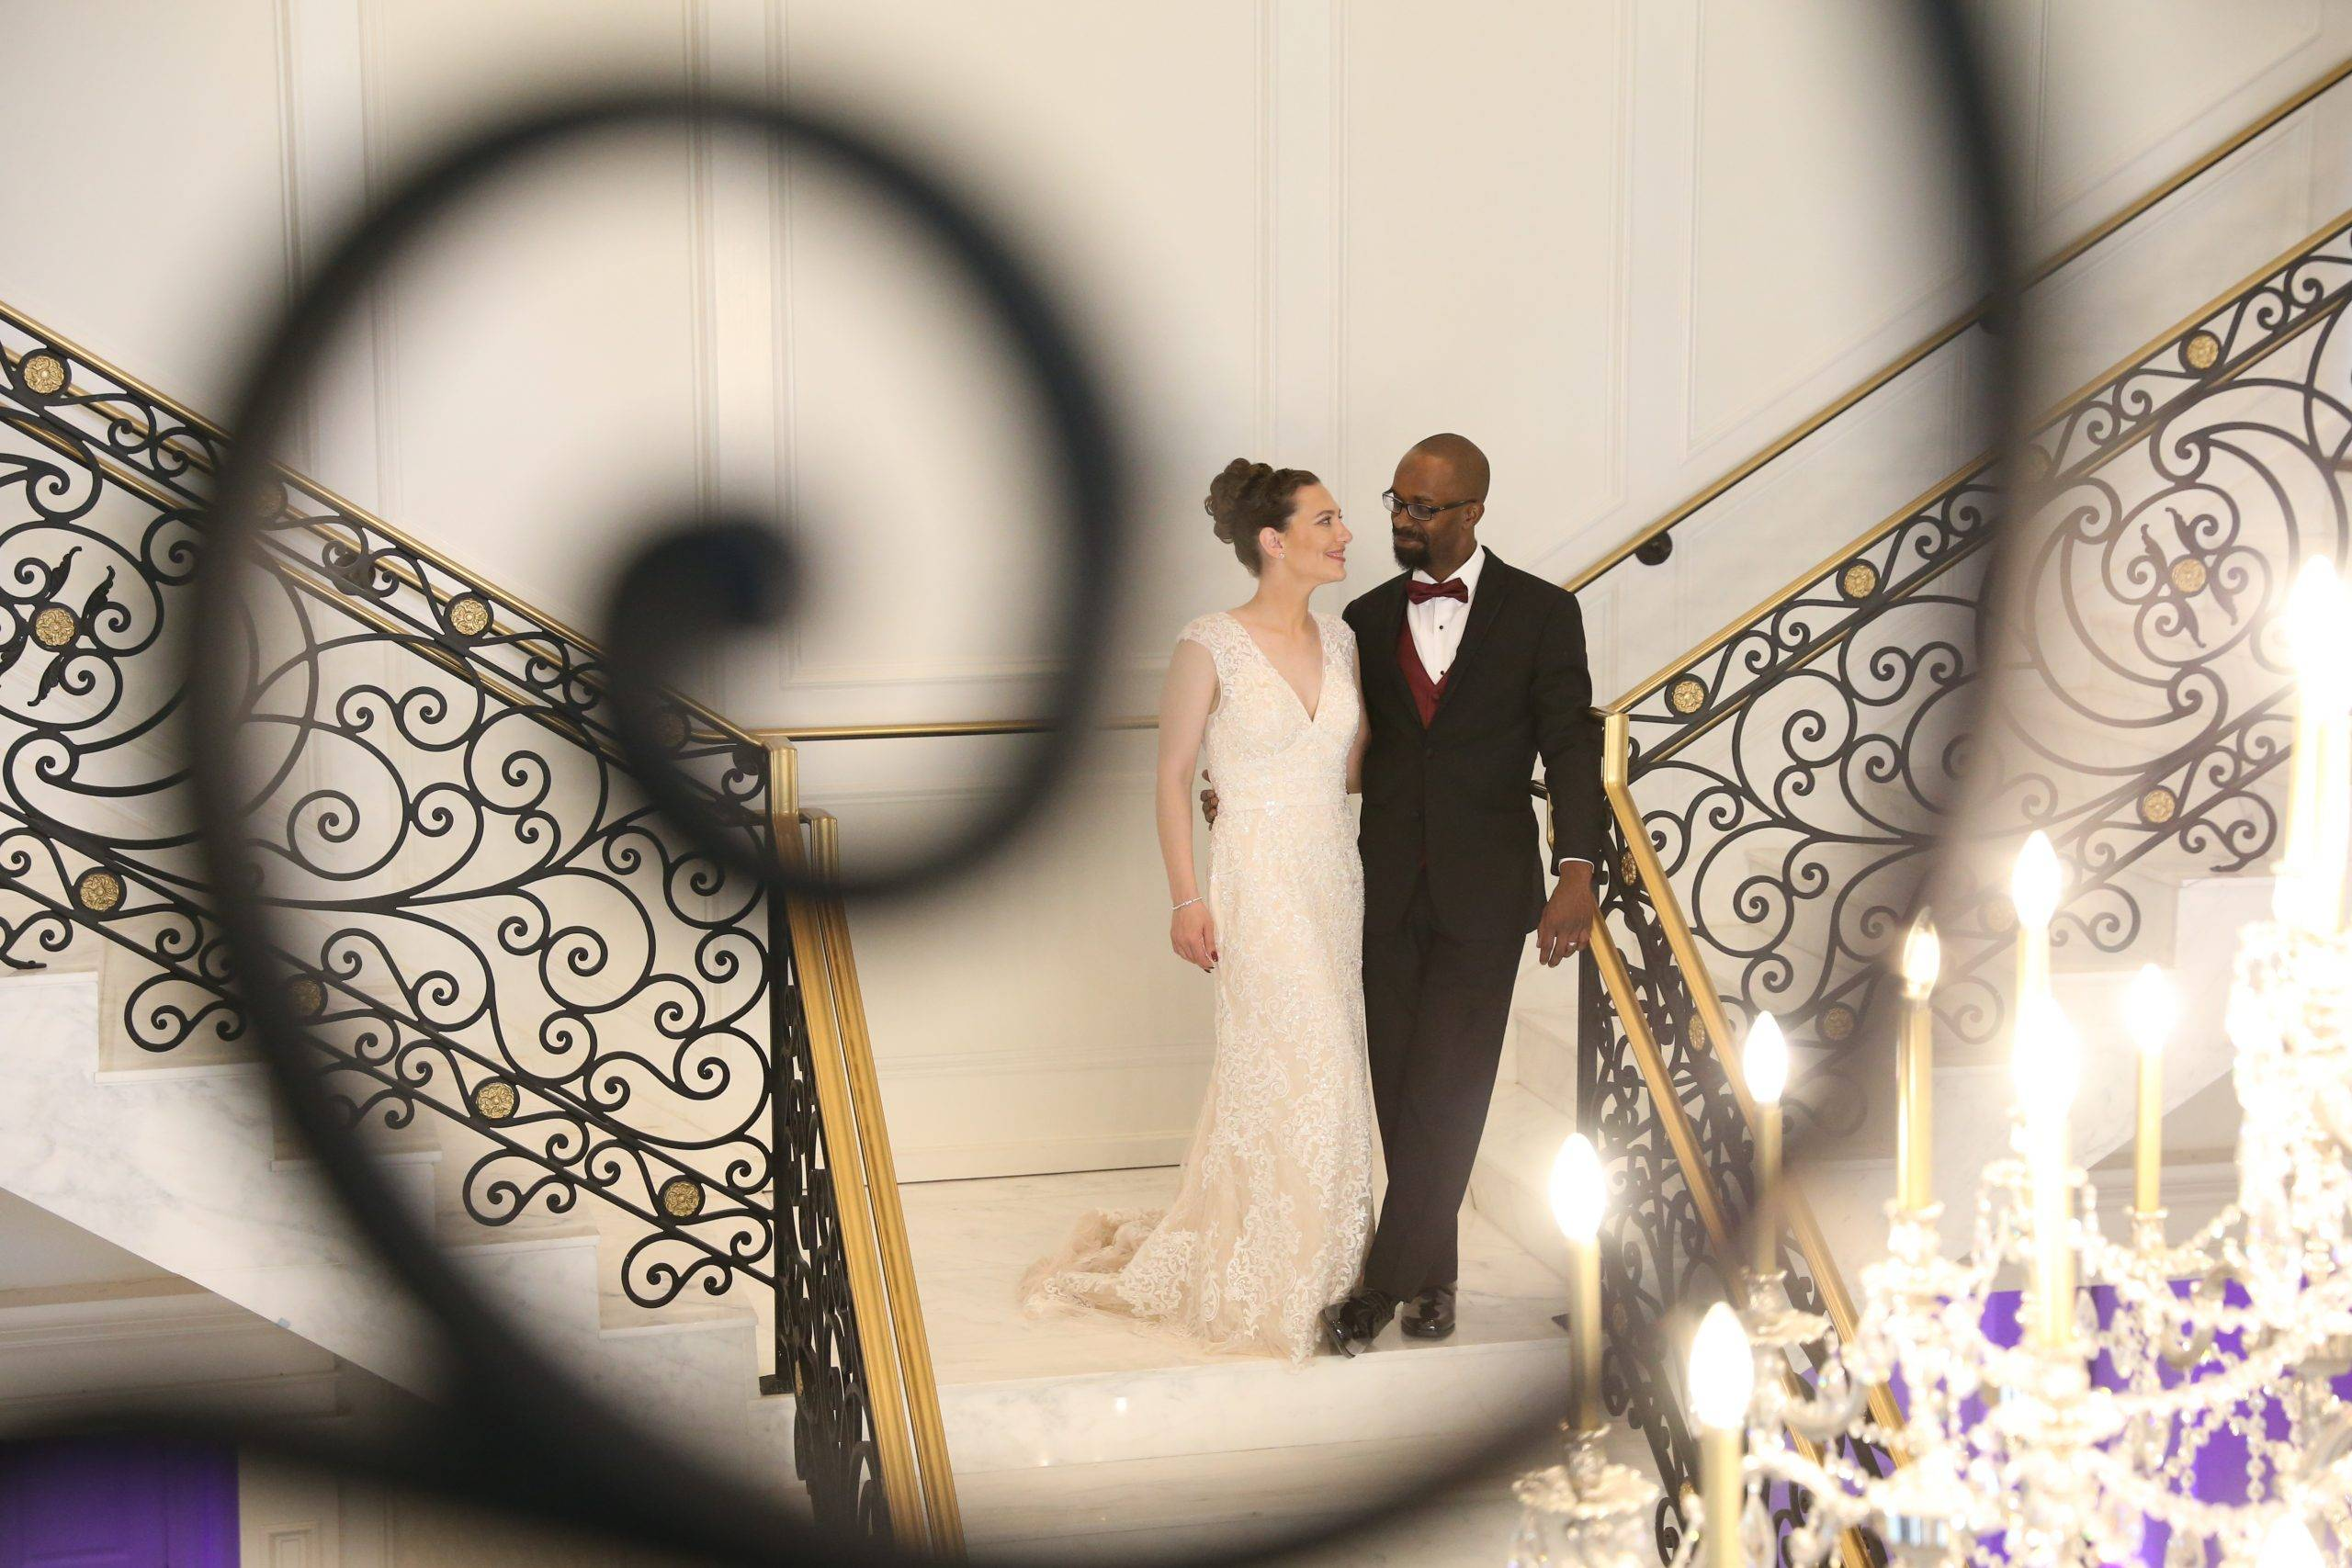 Meadow Wood bride and groom walking down grand staircase